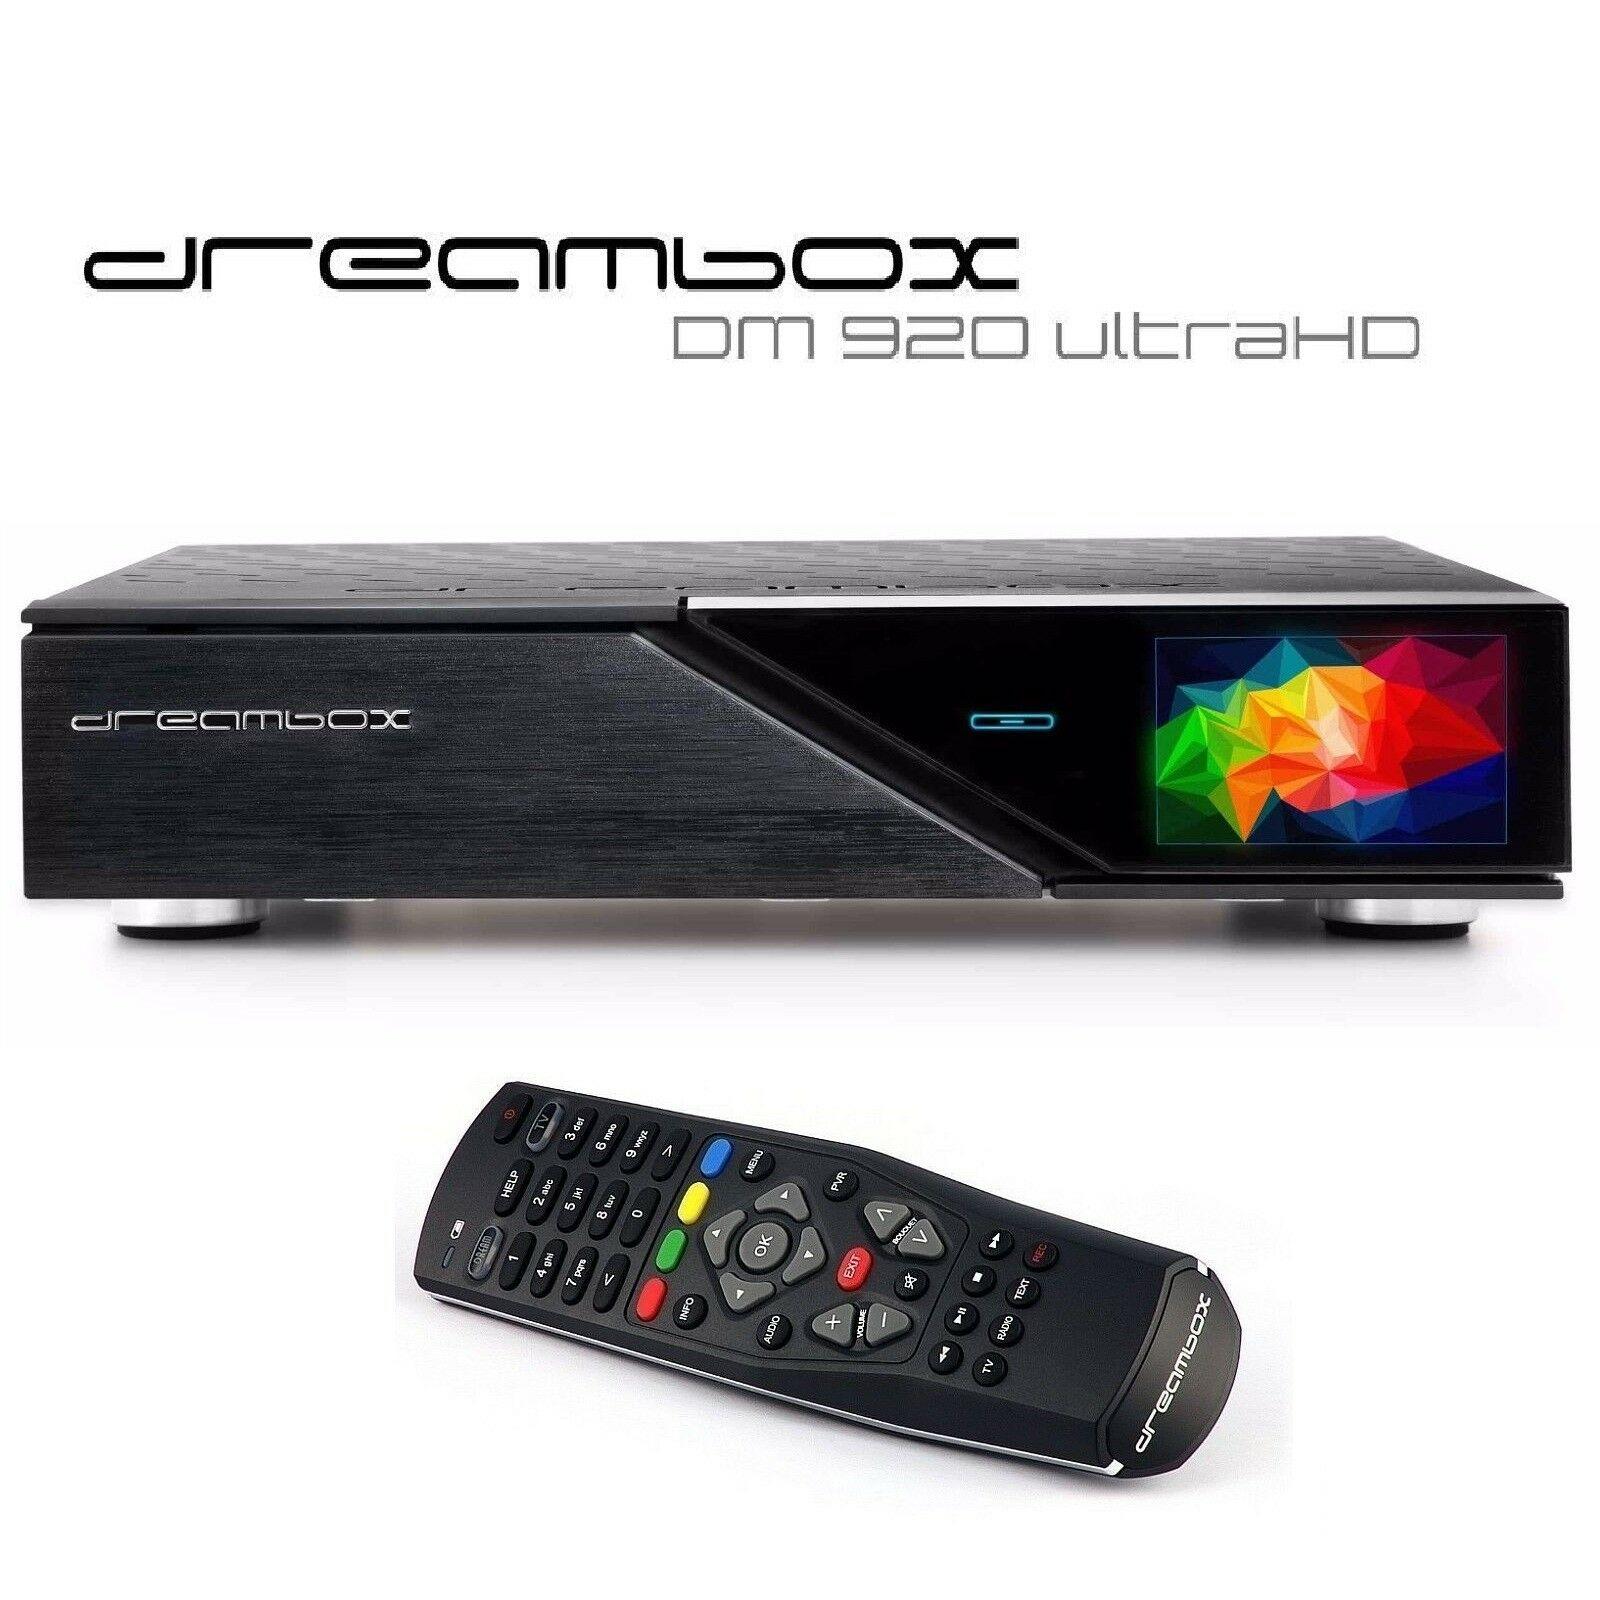 Dreambox DM920 UHD 4K 1x DVB-S2 FBC Tuner E2 Linux PVR Receiver